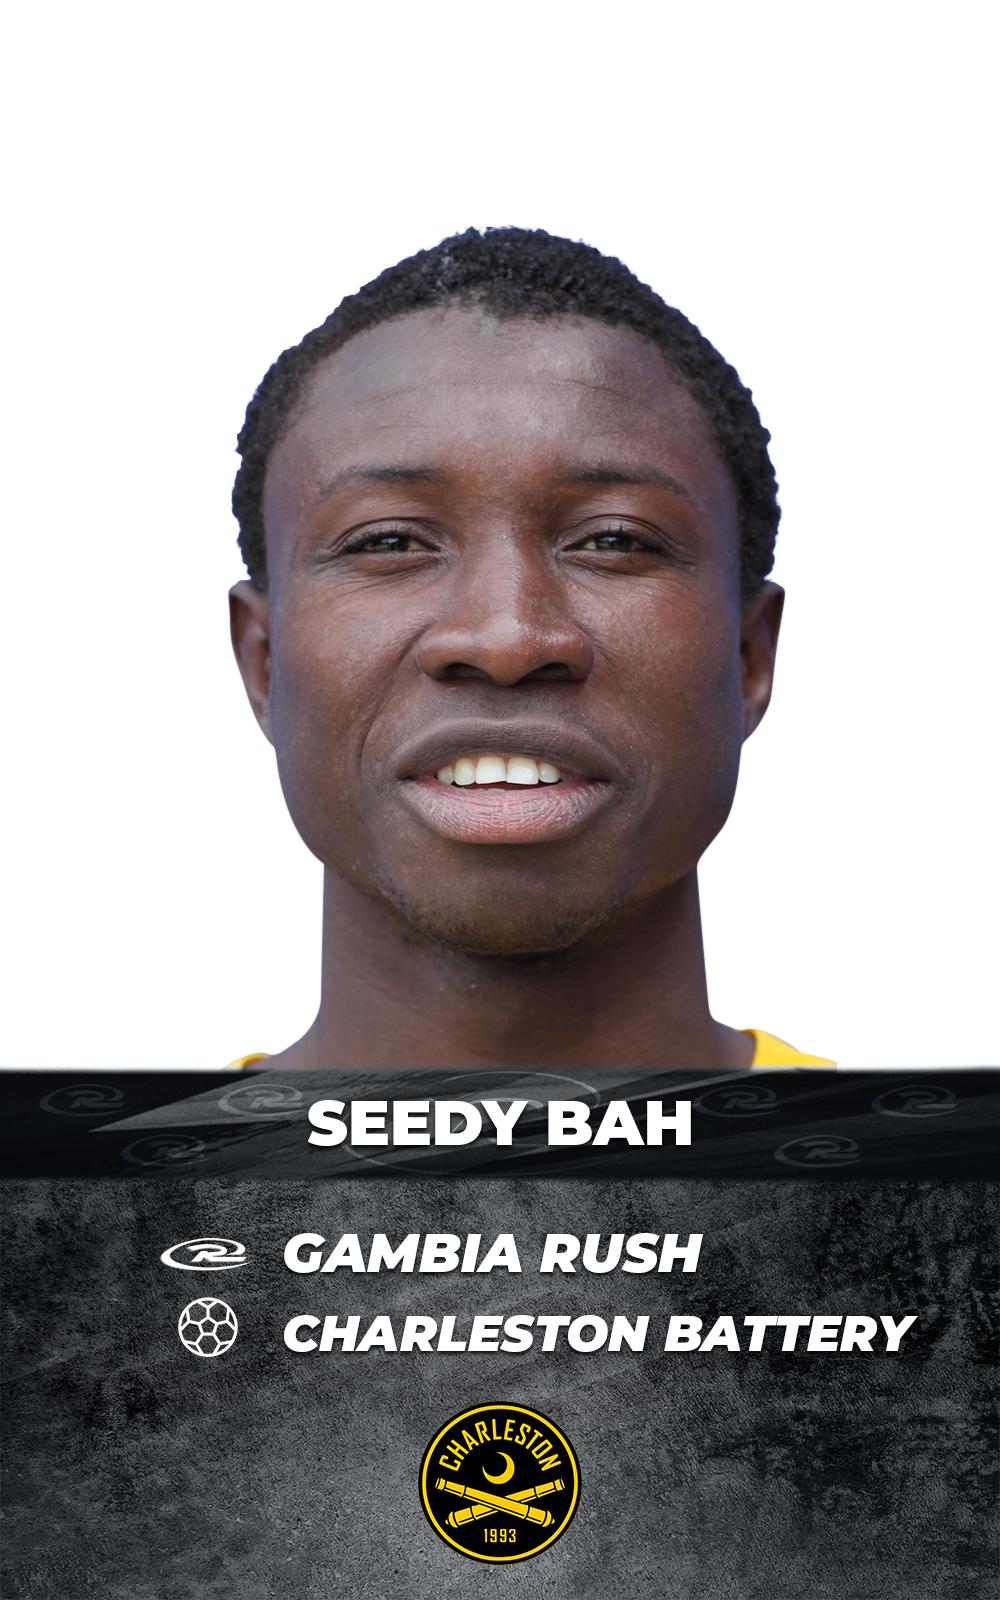 Seedy-Bah